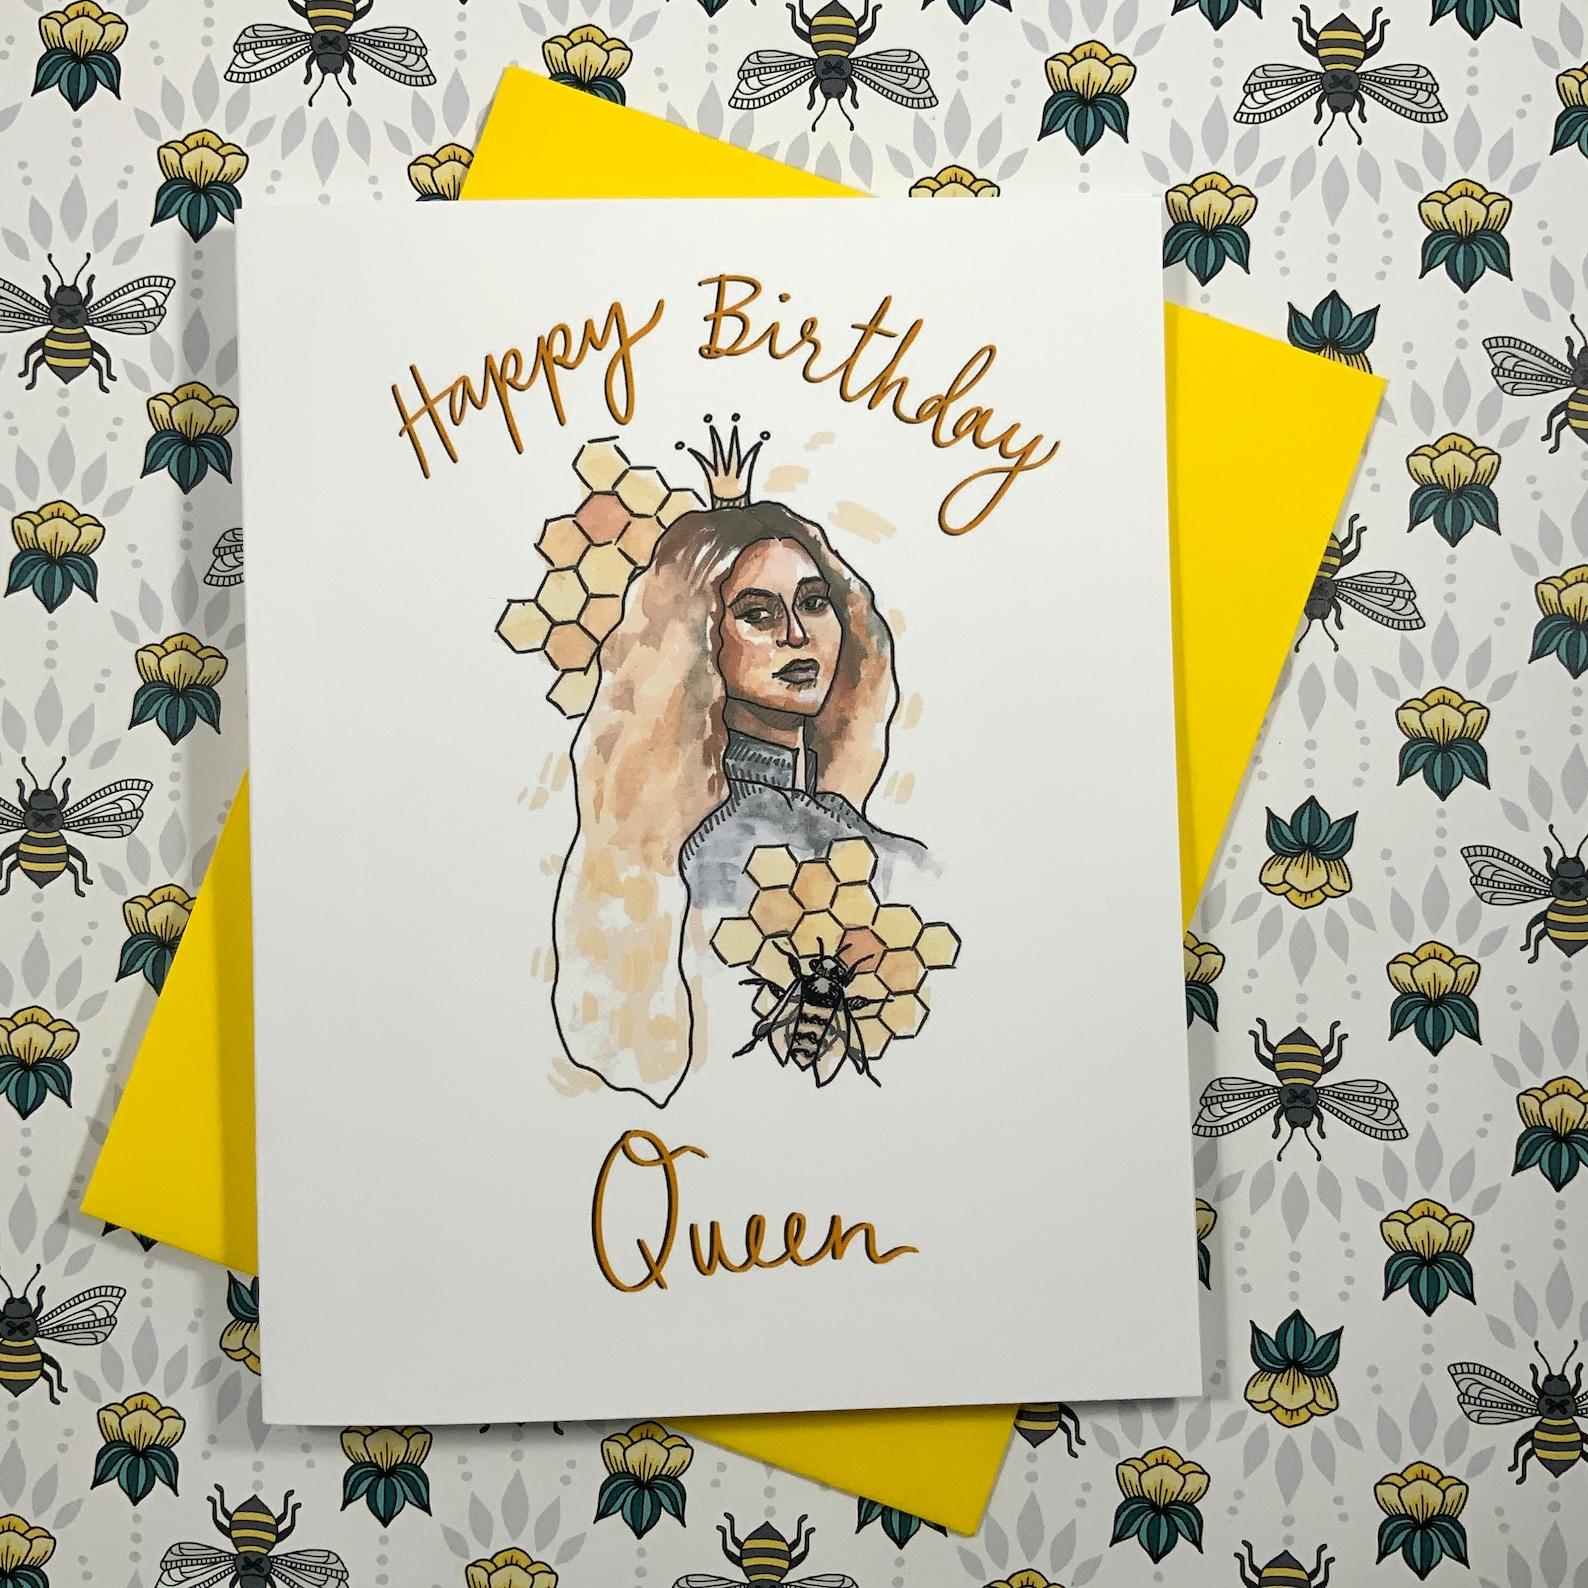 happy birthday queen birthday card beyonce birthday card